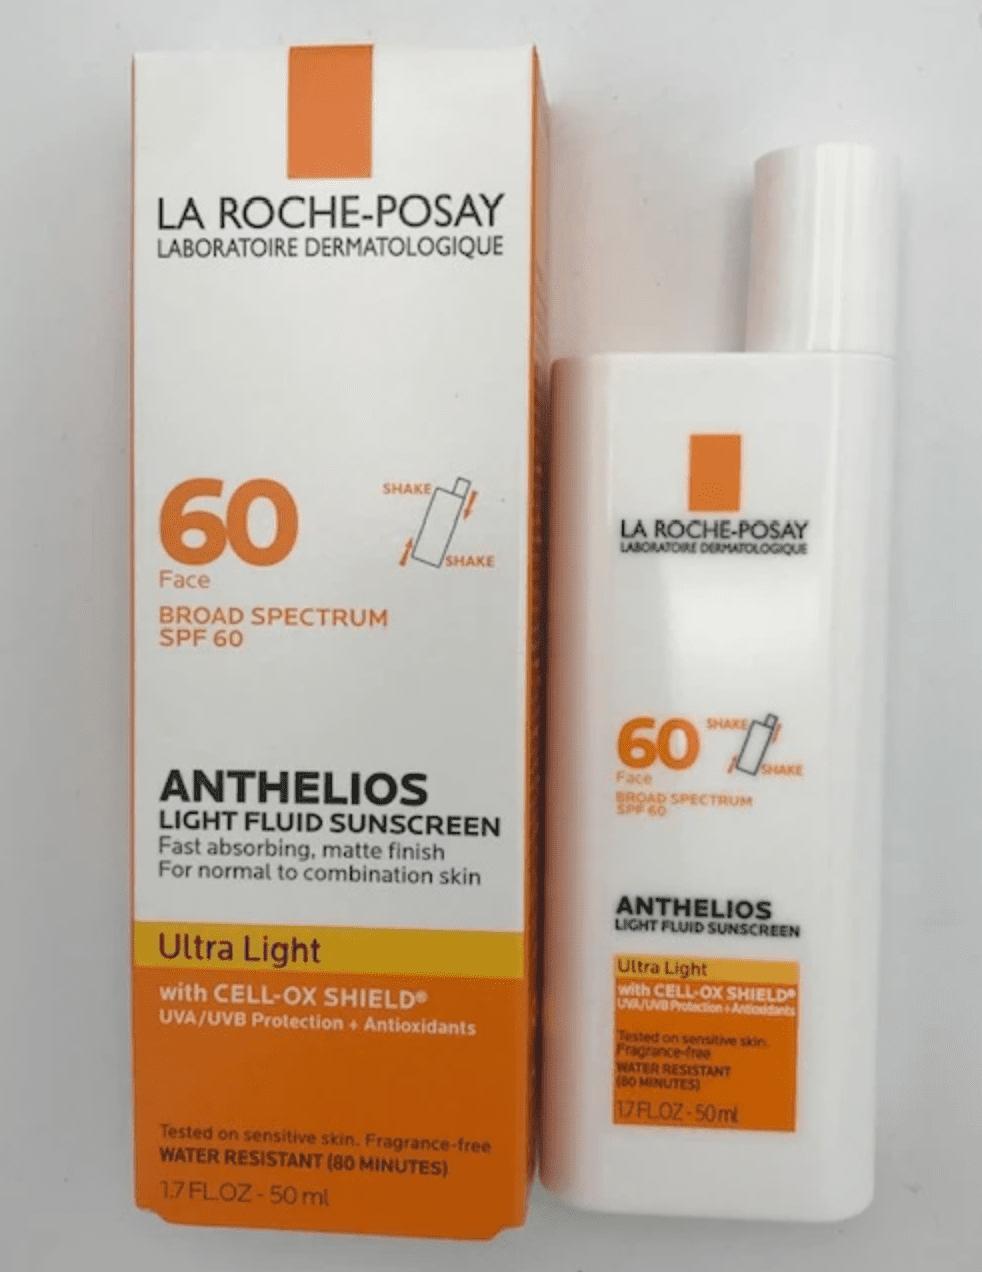 La Roche Posay Anthelios Ultra Light Face Sunscreen-SPF 60